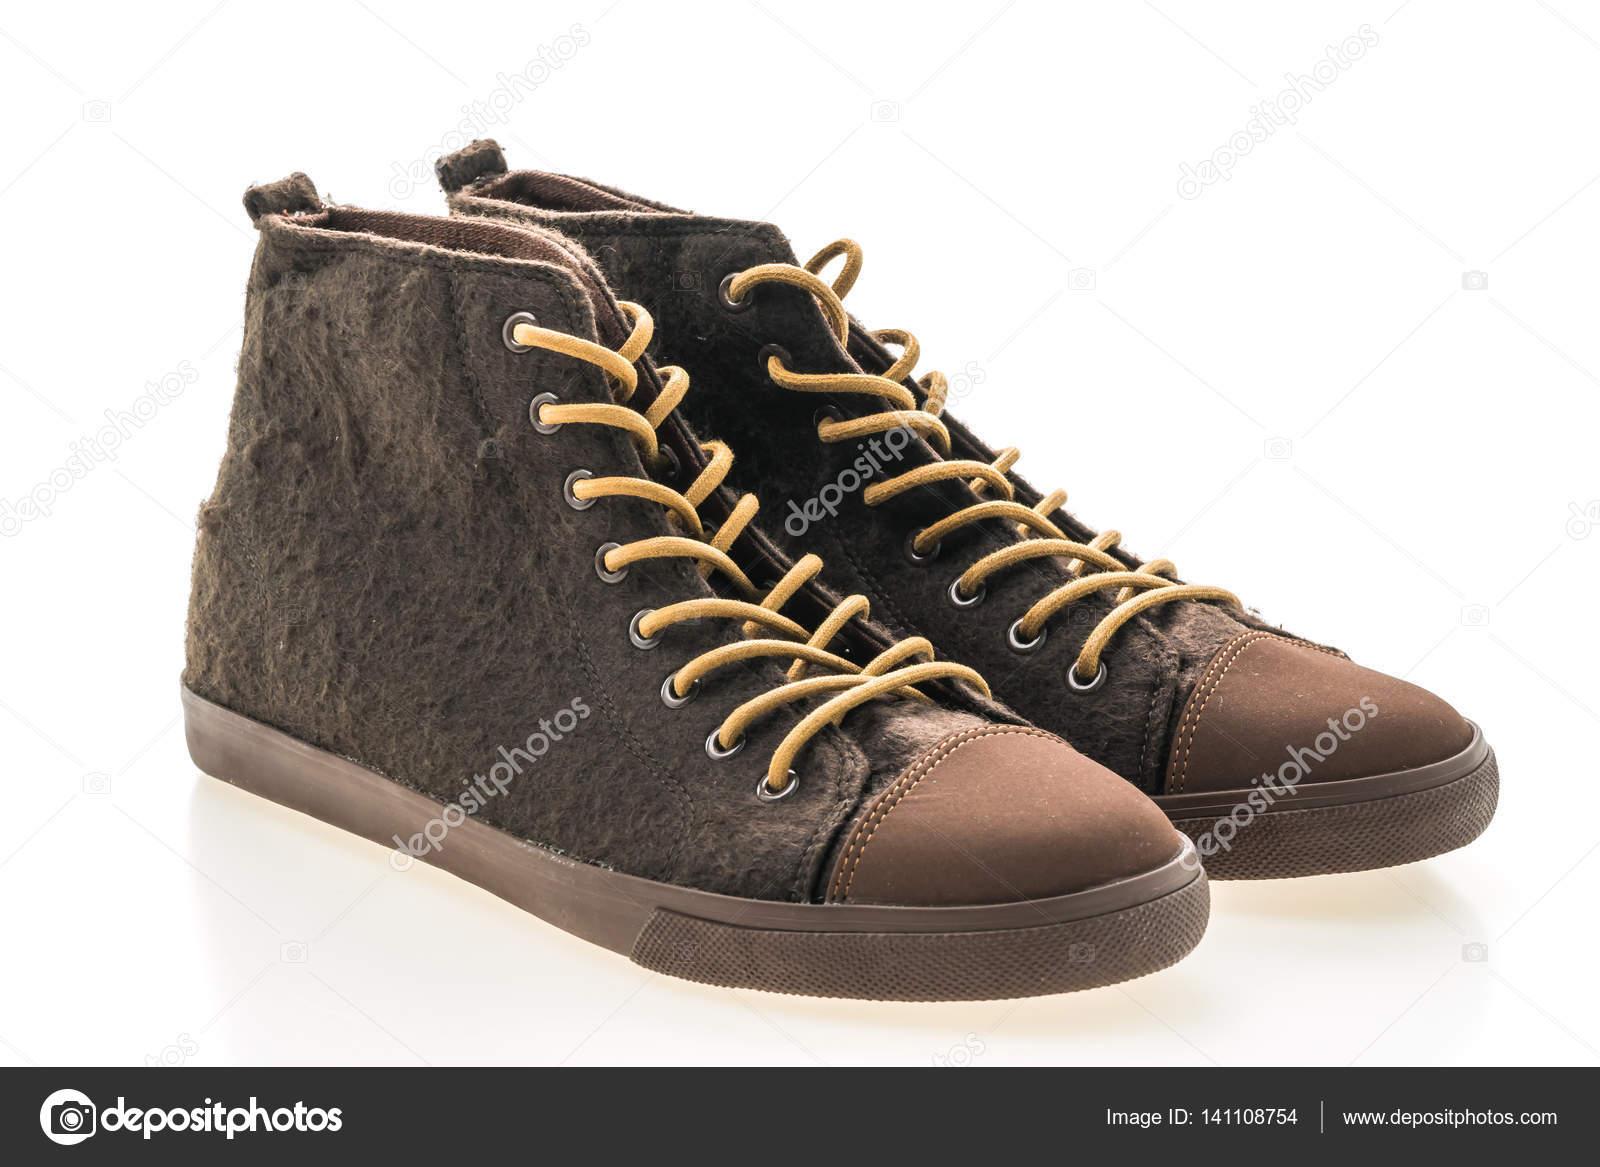 1ecc8dfce92 Μοντέρνα παπούτσια μόδας — Φωτογραφία Αρχείου © mrsiraphol #141108754